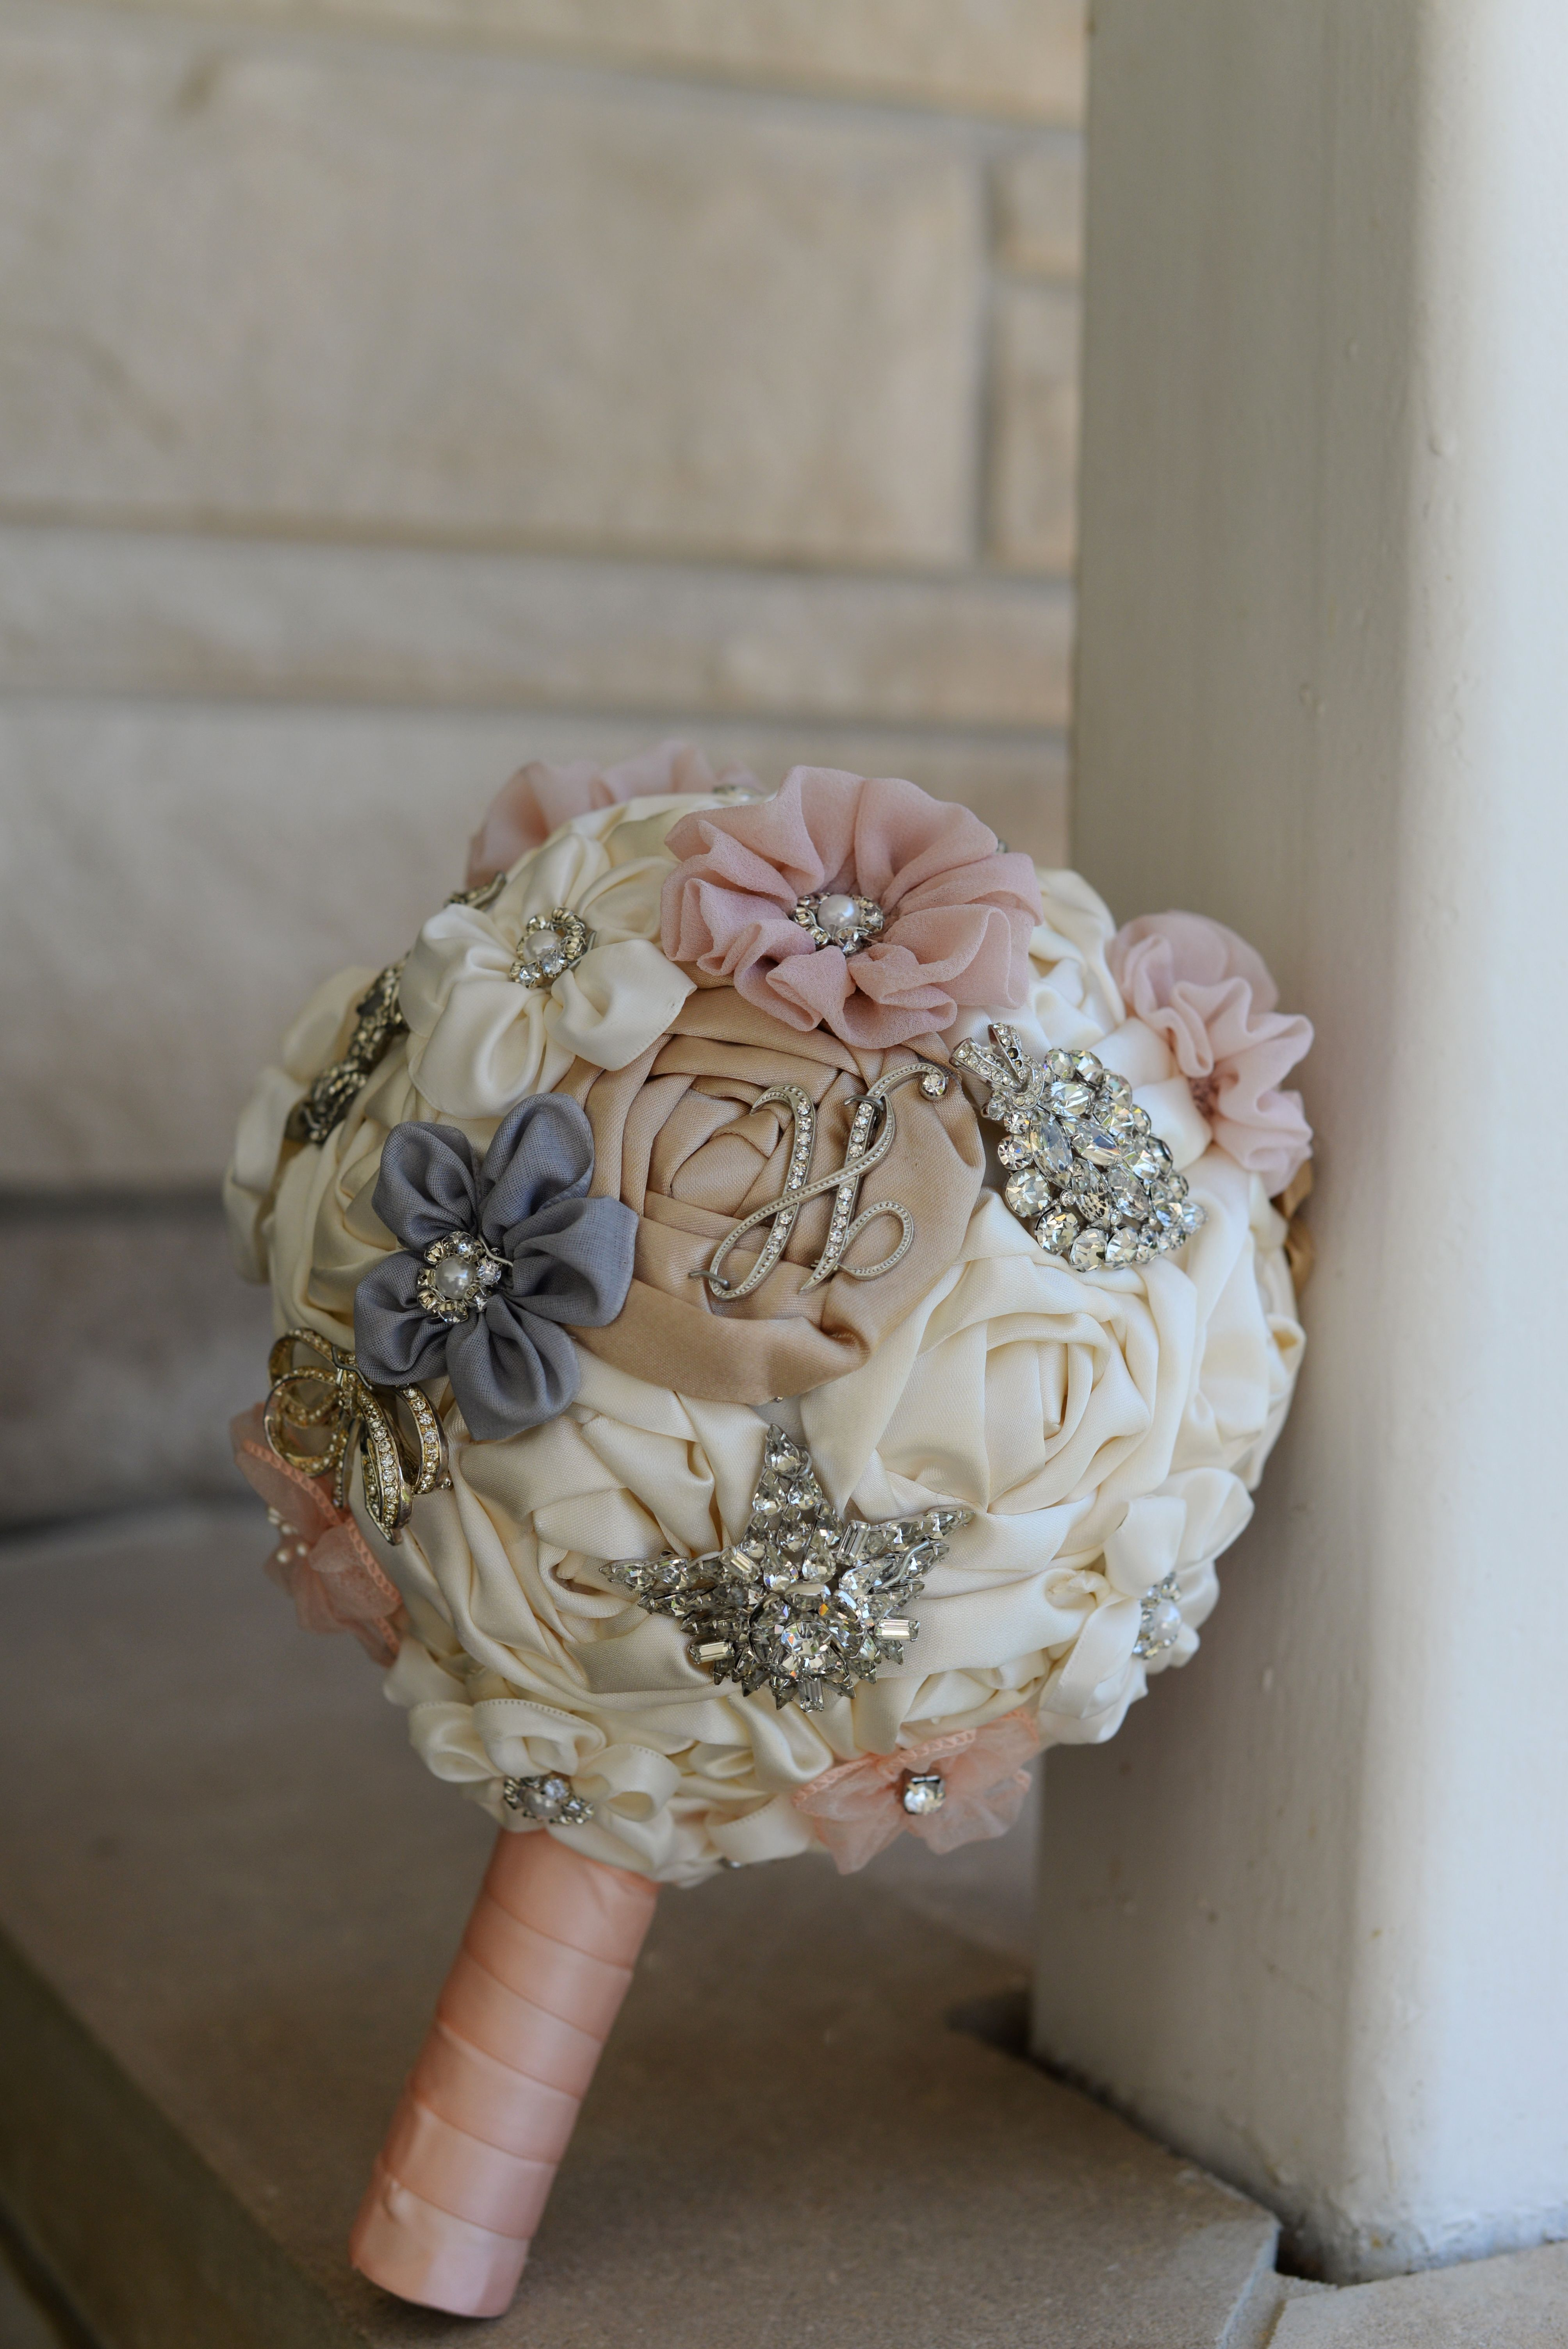 Ribbon Flower Brooch Wedding Bouquet Made My Brides Grandmother